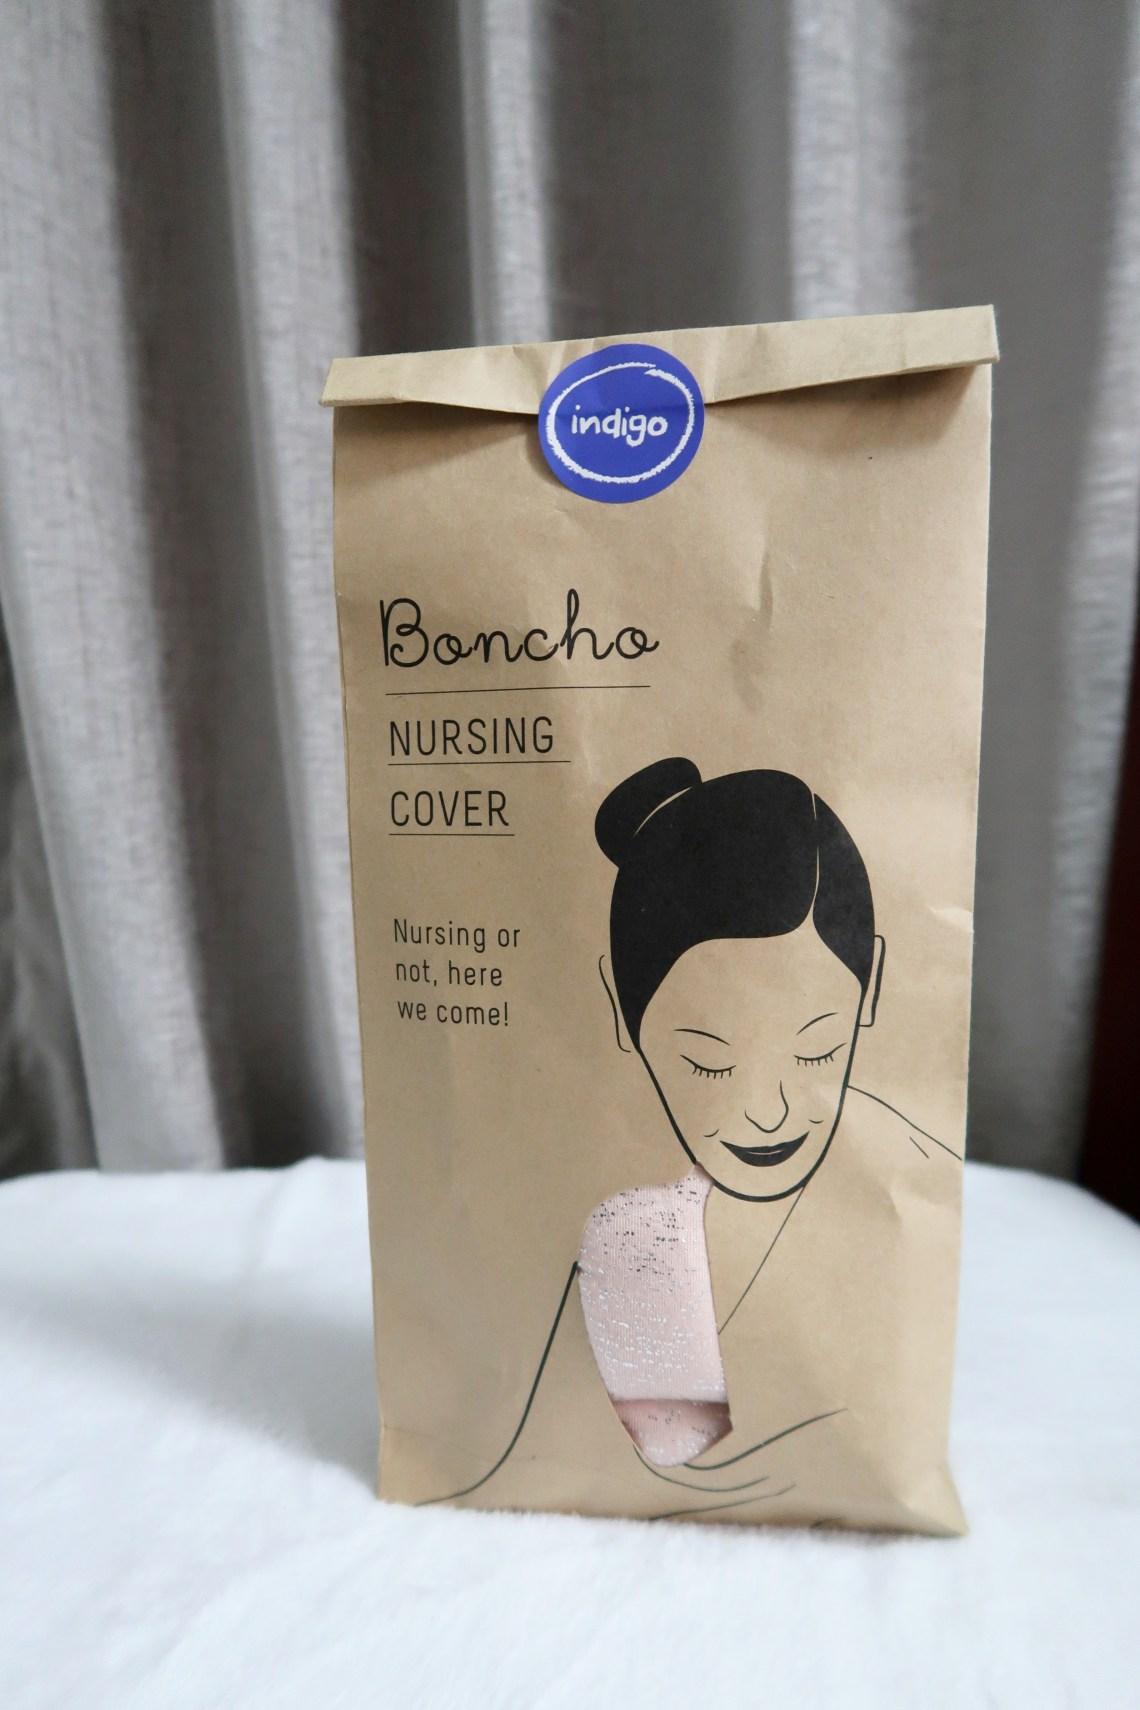 dyosathemomma: Top Breastfeeding Essentials, Indigo Boncho Nursing Cover